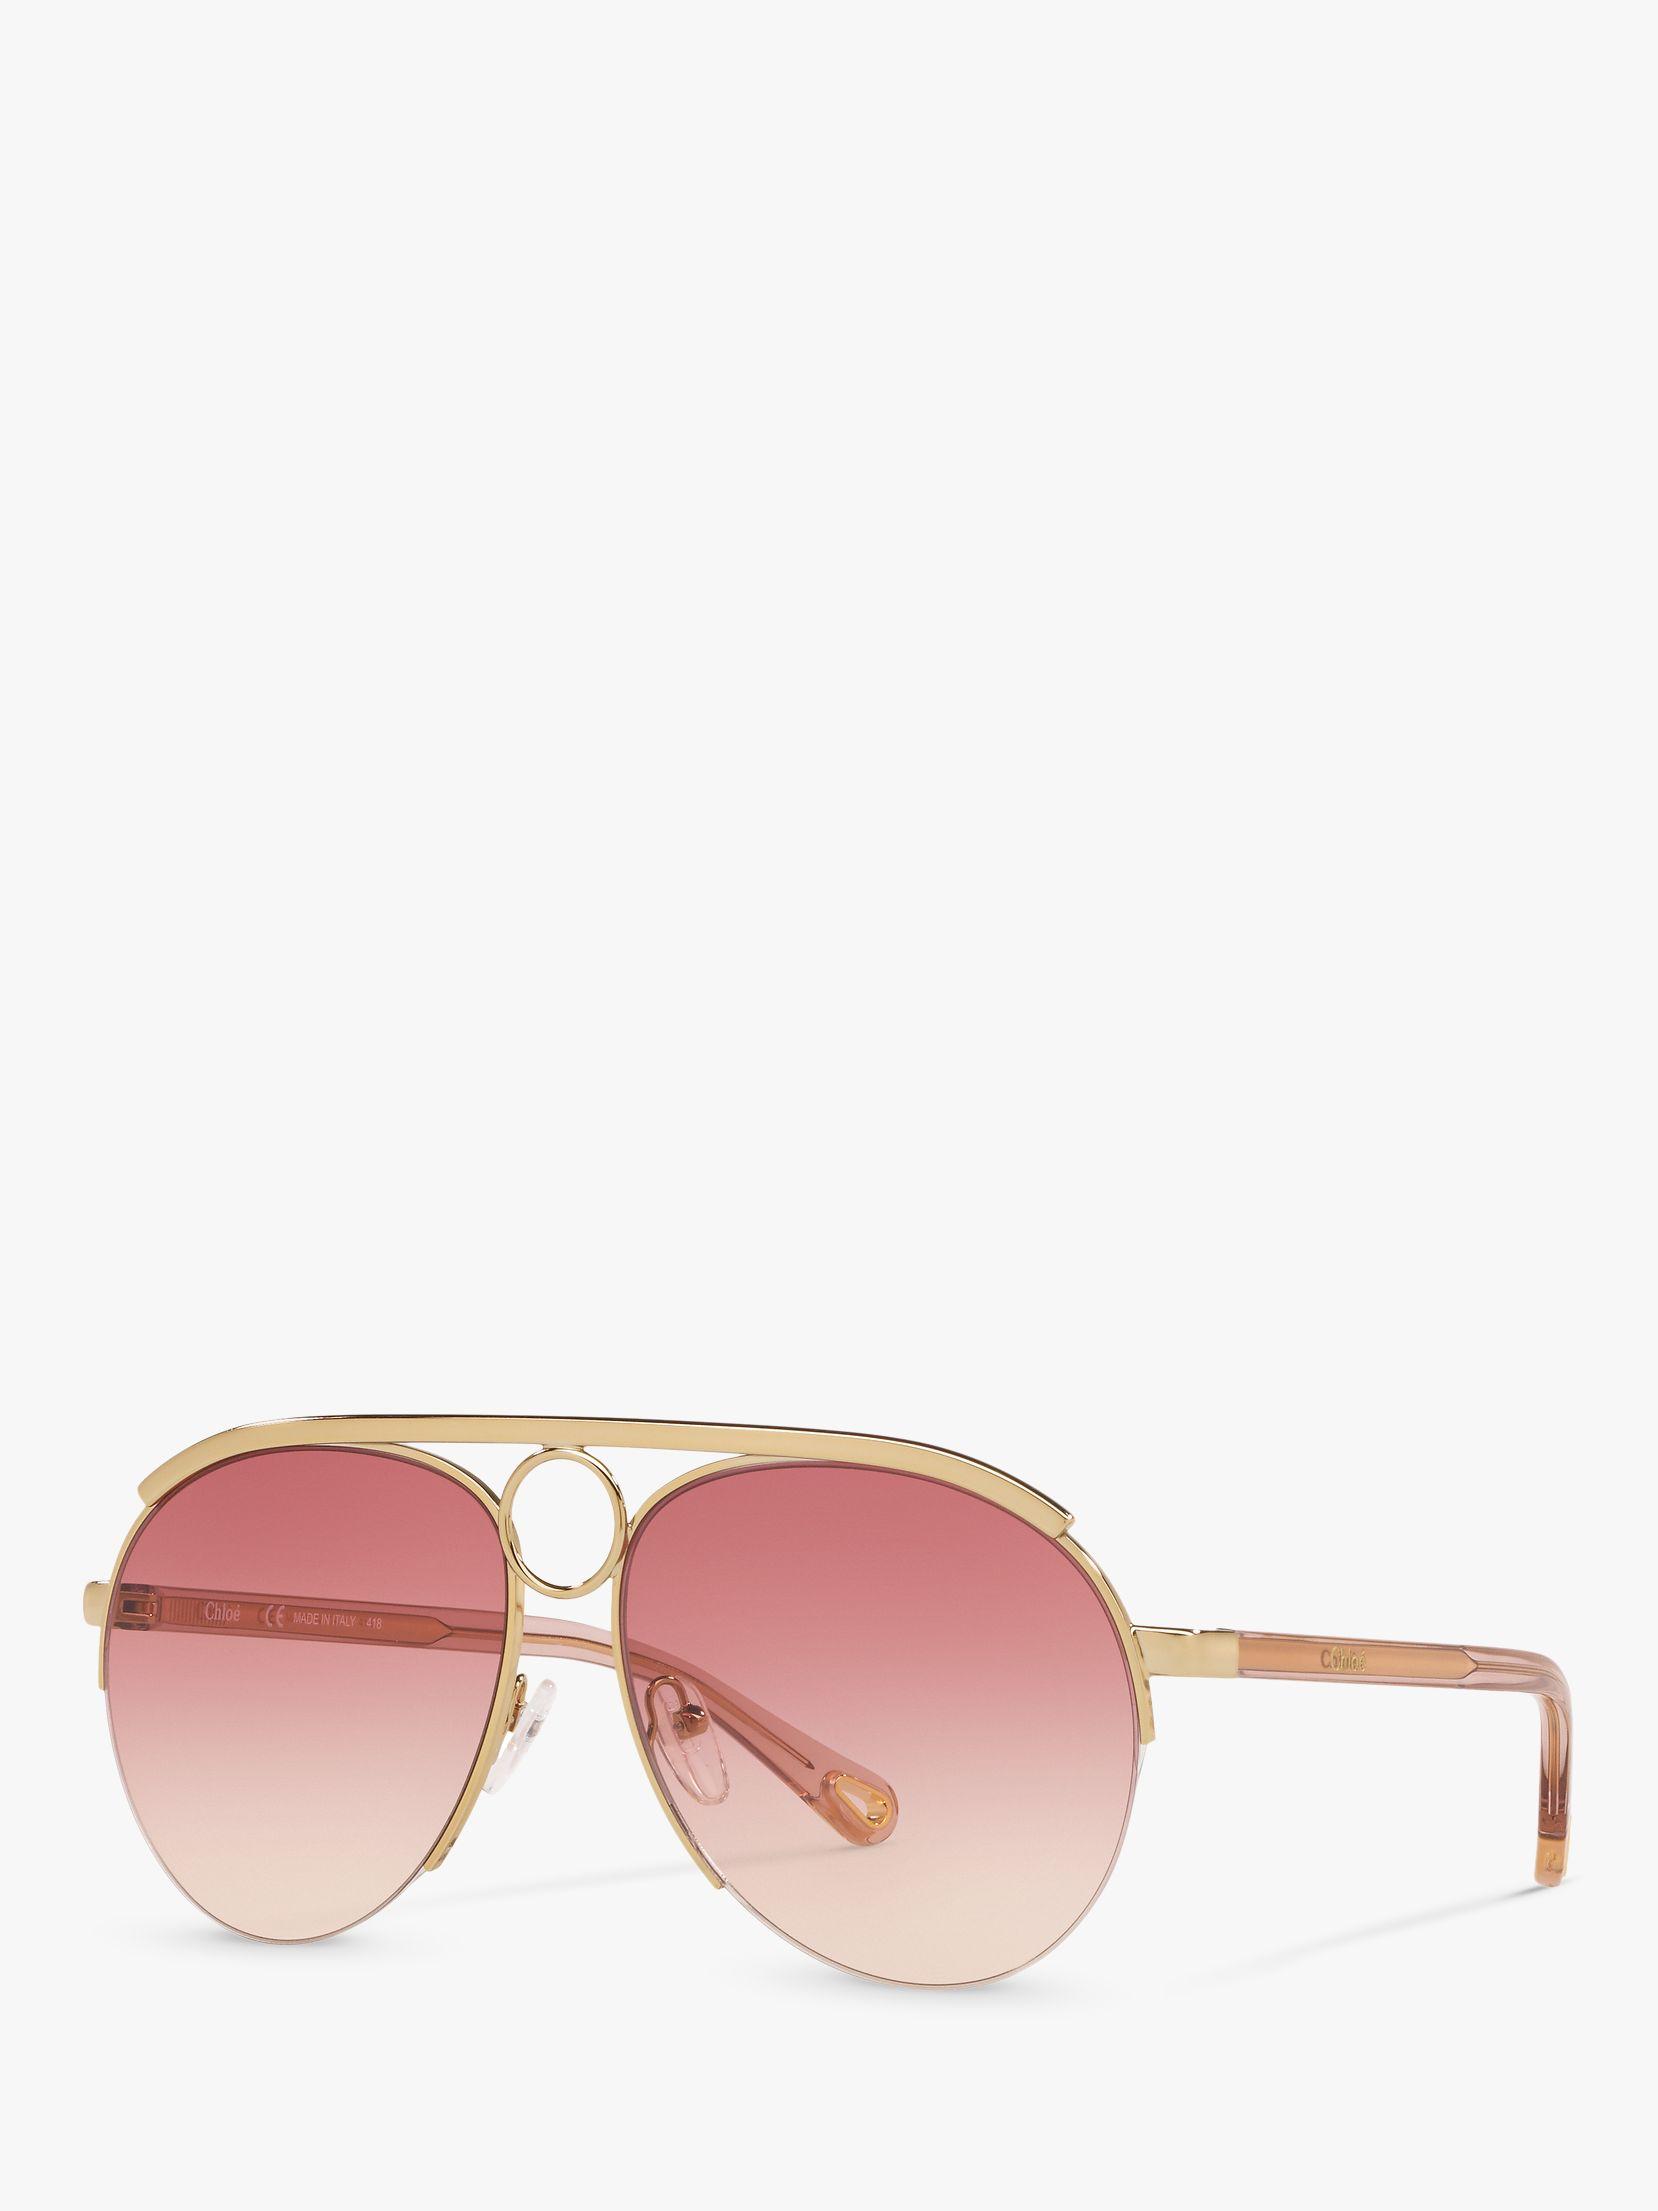 Chloe Chloé CE152S Women's Aviator Sunglasses, Gold/Pink